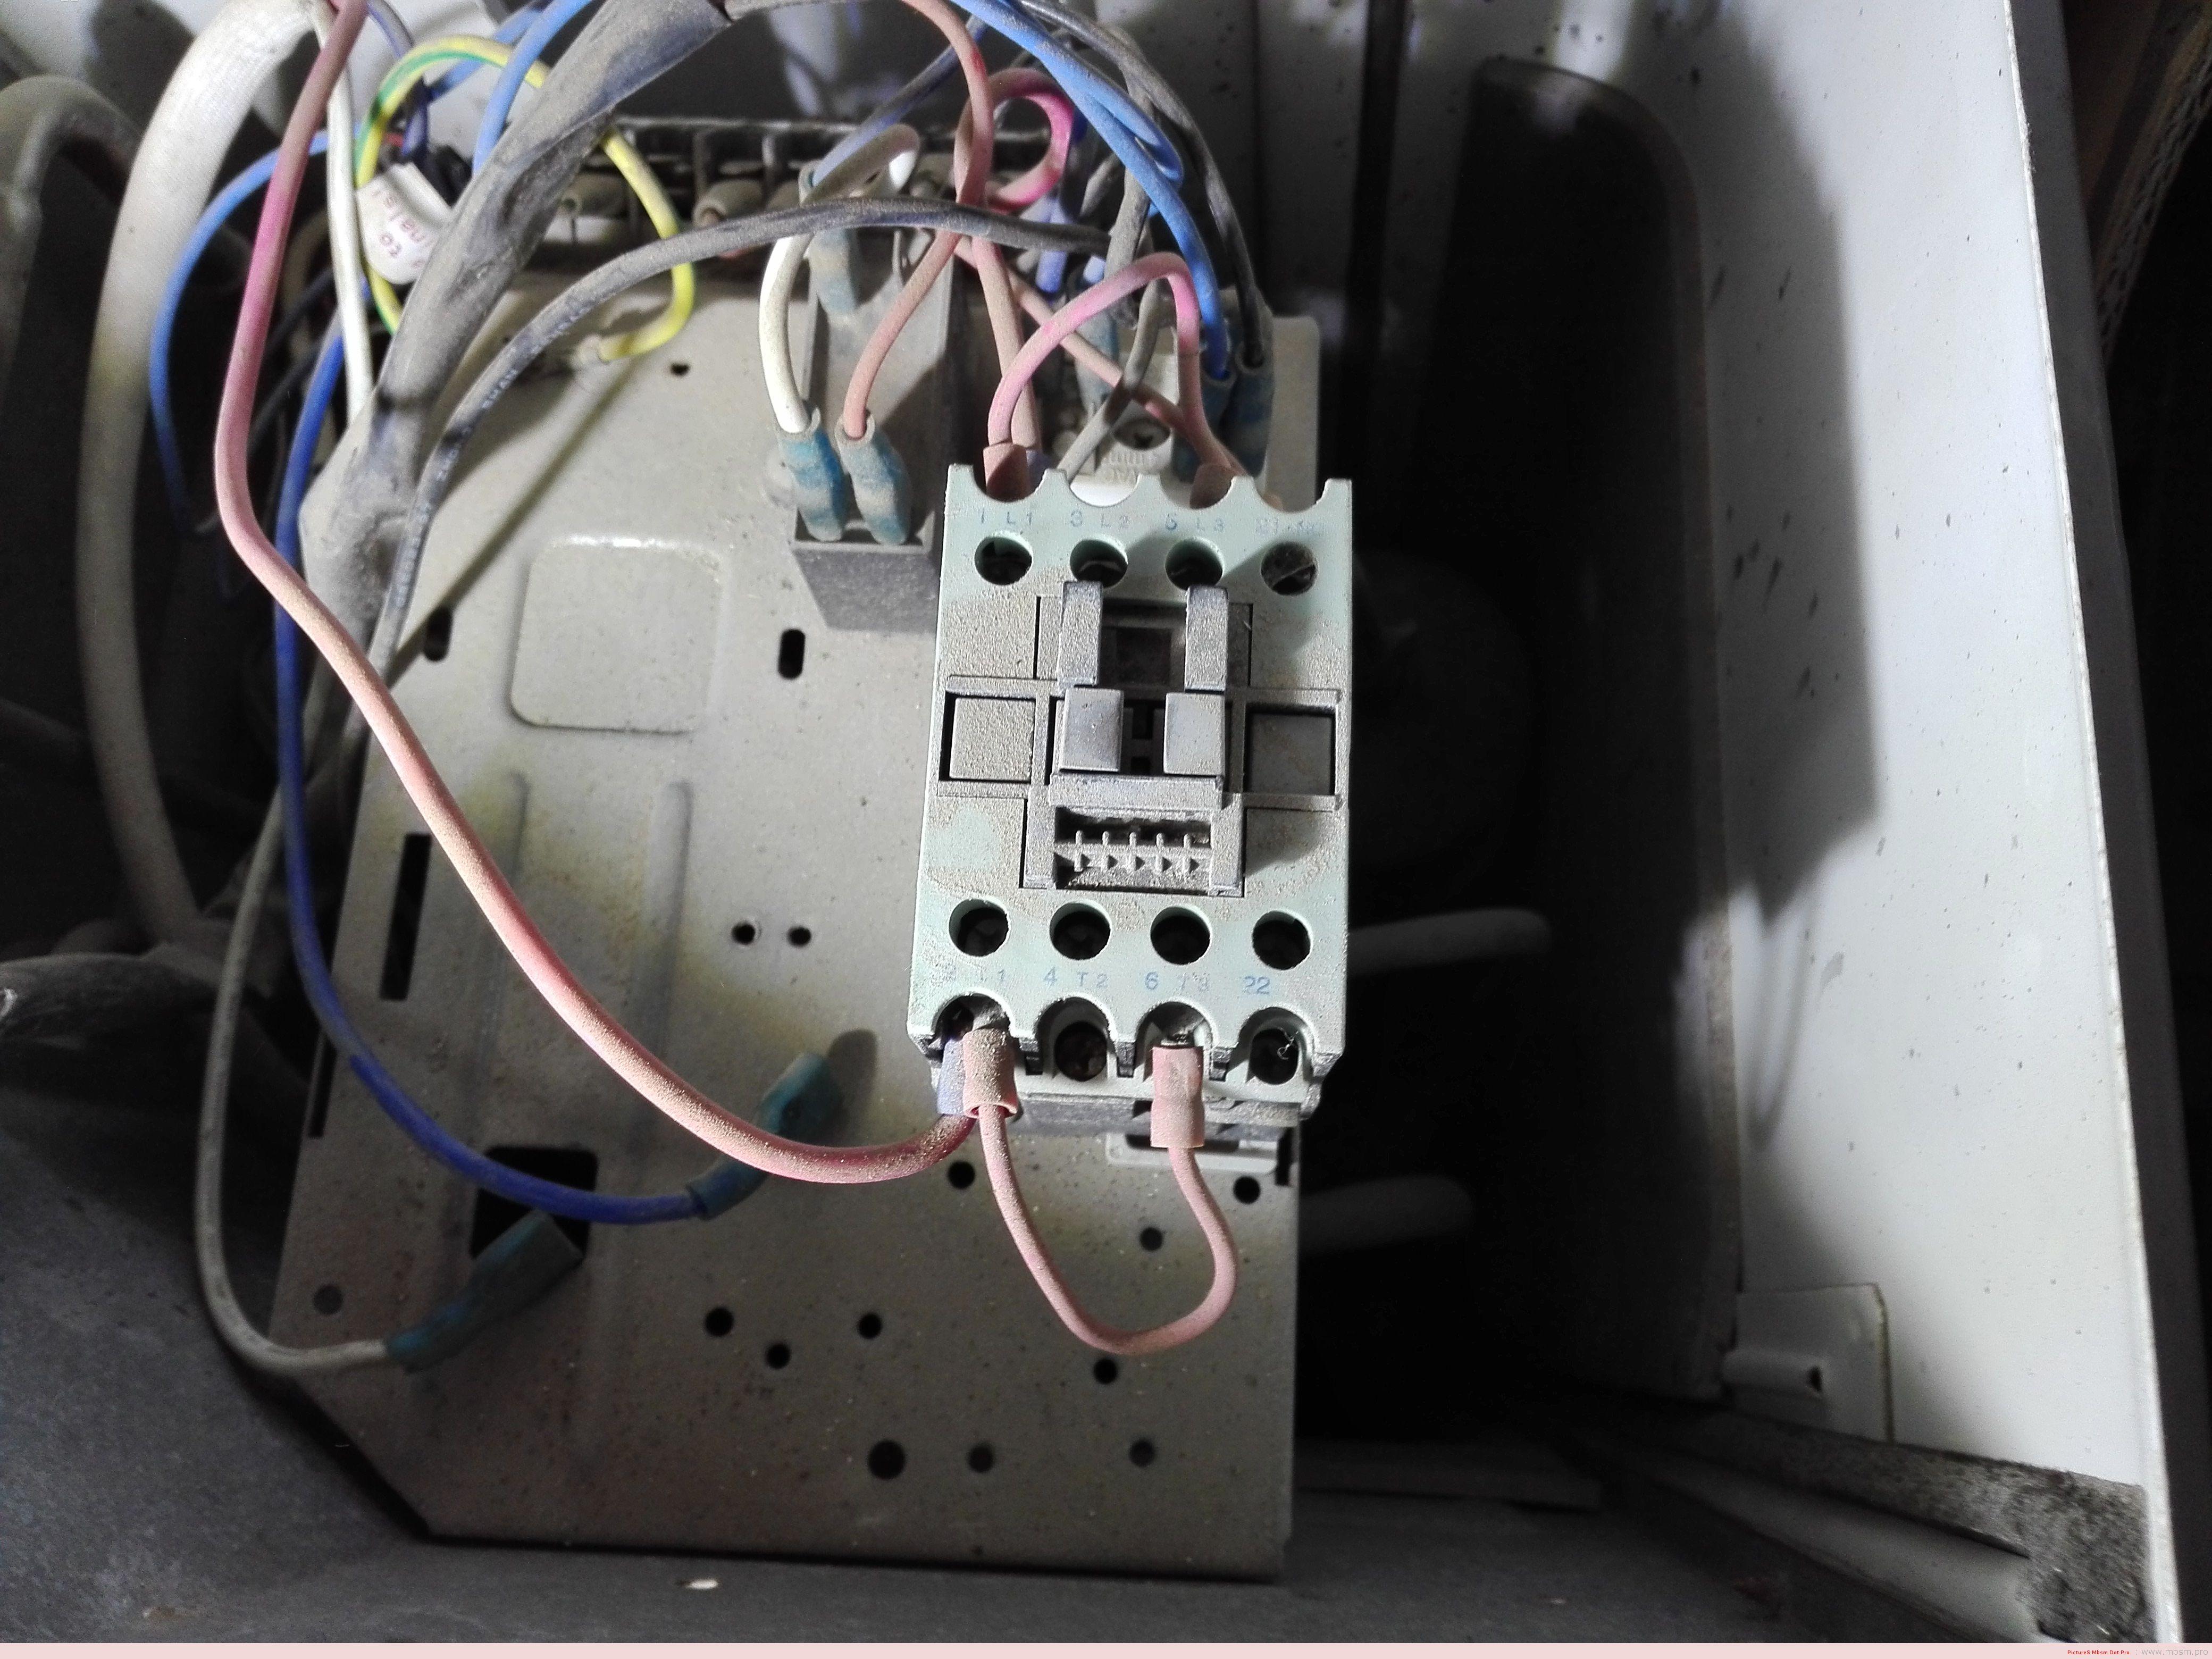 mbsm-dot-pro-wwwmbsmpro-branchement-de-contacteur-de-rponse-carte-mre-climatiseur-sharp